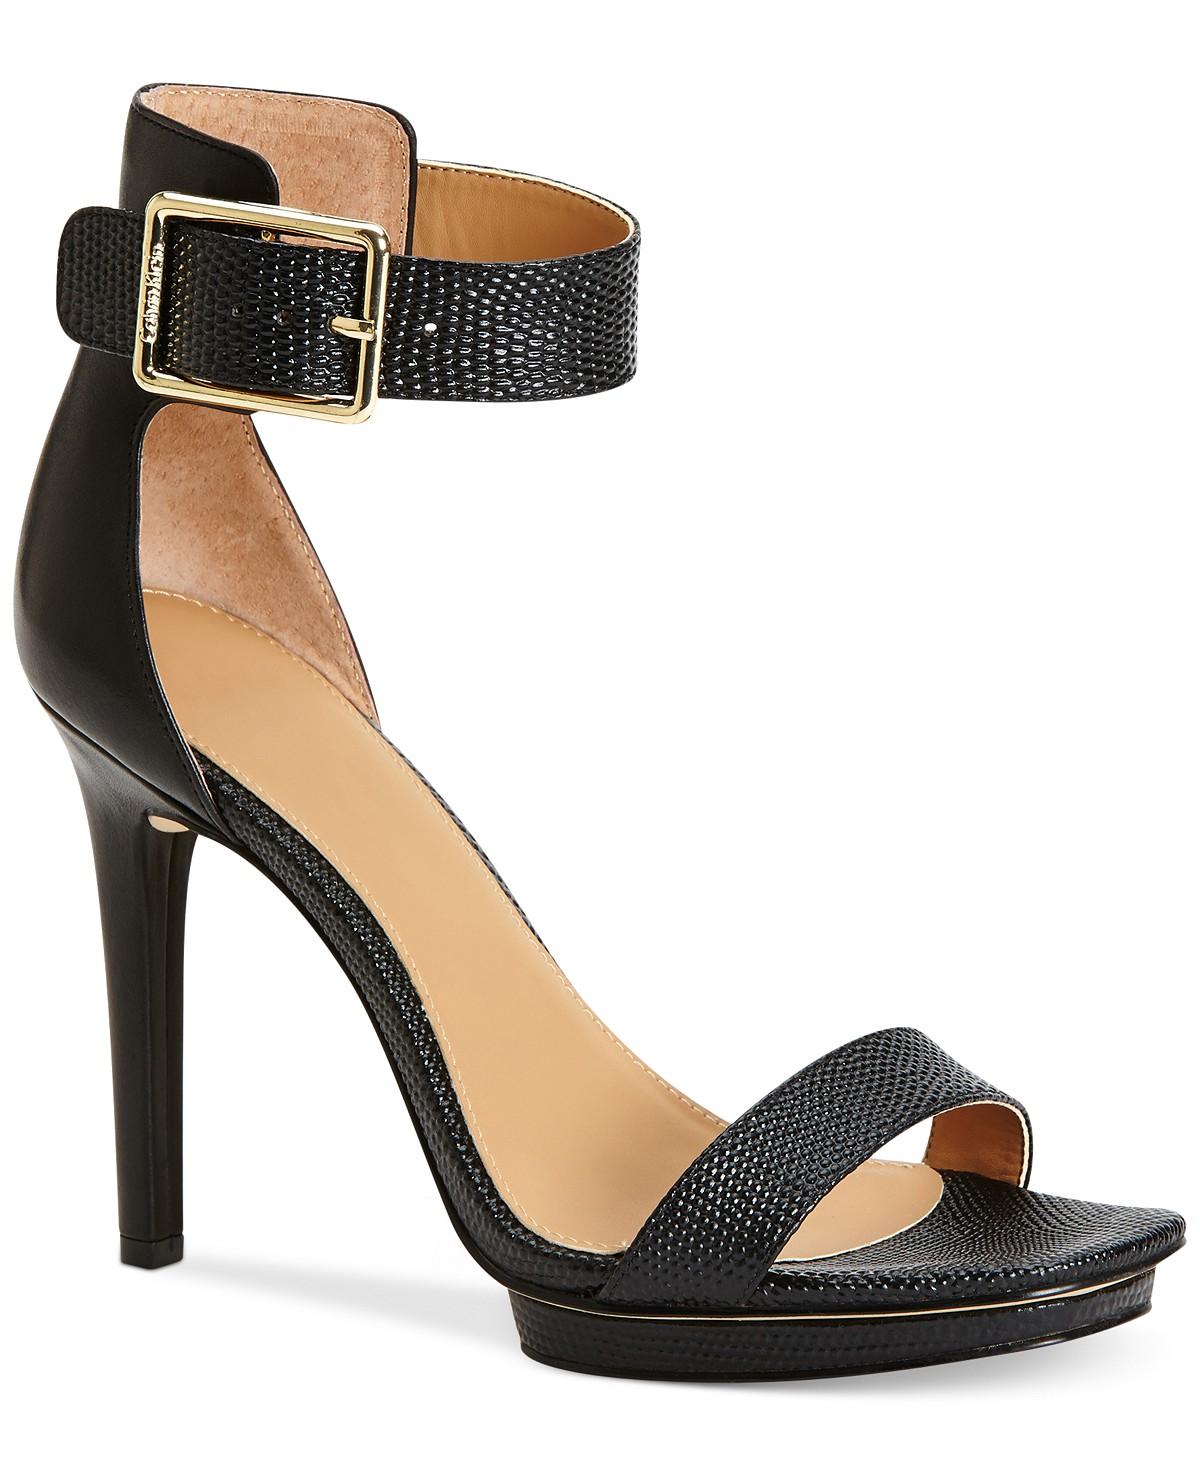 Calvin Klein Vable Sandals.jpeg